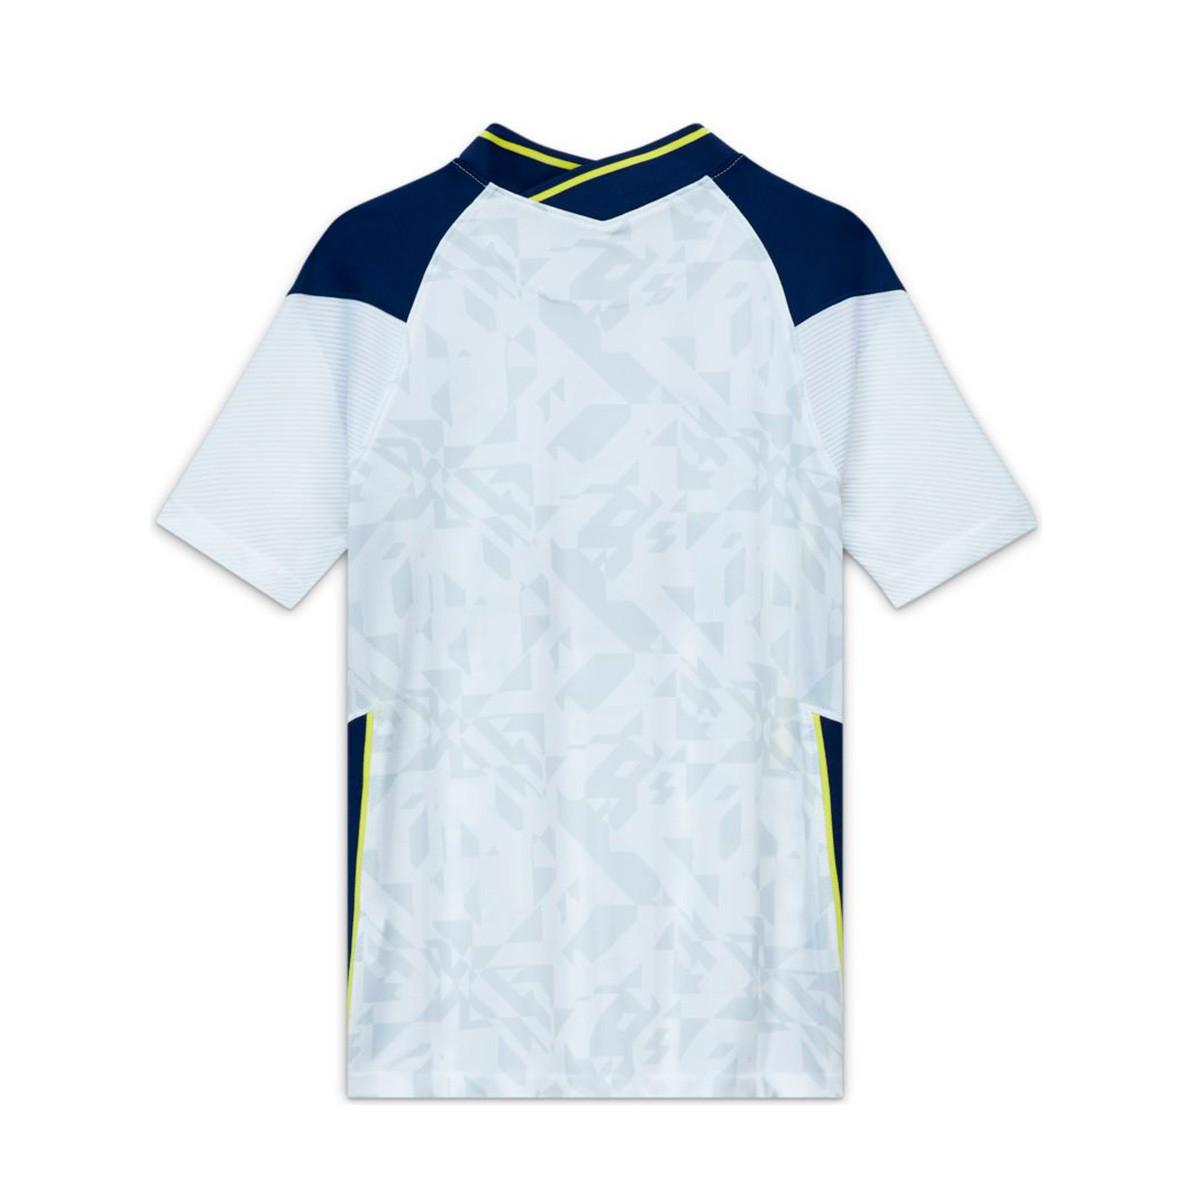 Jersey Nike Tottenham Hotspur Fc Stadium Primera Equipacion 2020 2021 Nino White Binary Blue Football Store Futbol Emotion